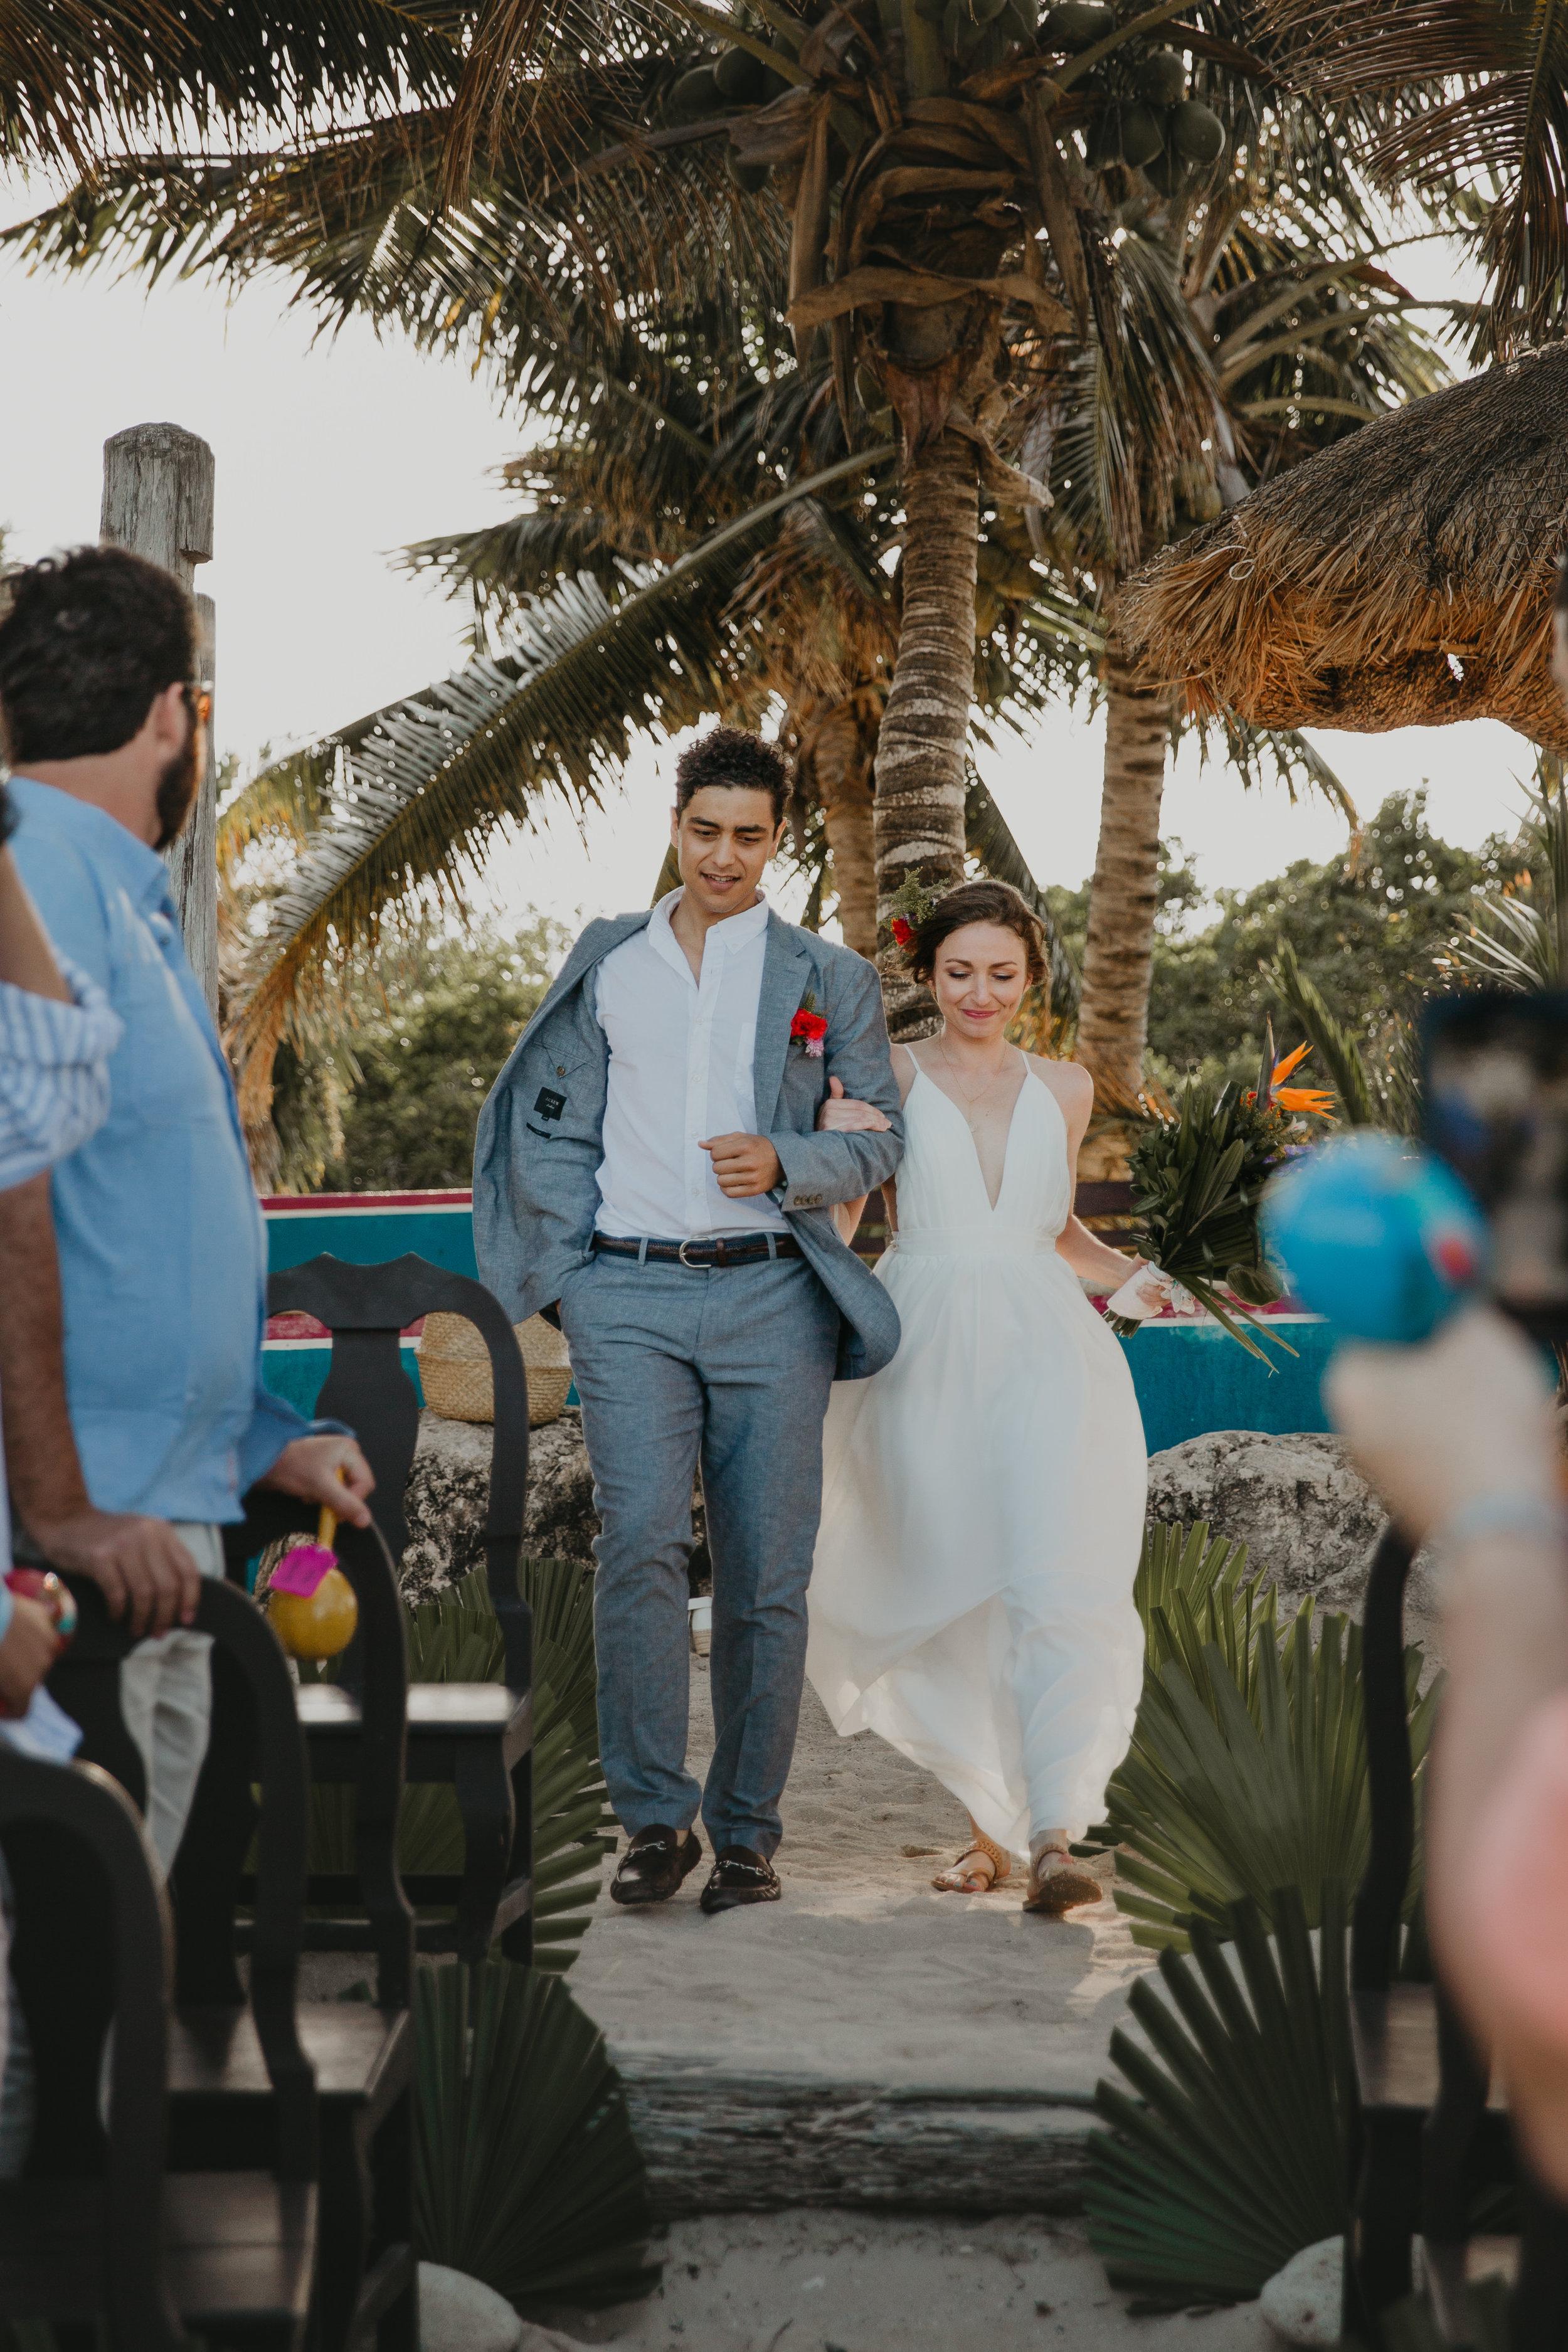 Nicole-Daacke-Photography-beachfront-akumal-destionation-wedding-tulum-mexico-elopement-photographer-destination-wedding-inspiration-sunset-champagne-pop-boho-bride-ocean-tropical-bohemian-tulum-wedding-photos-154.jpg